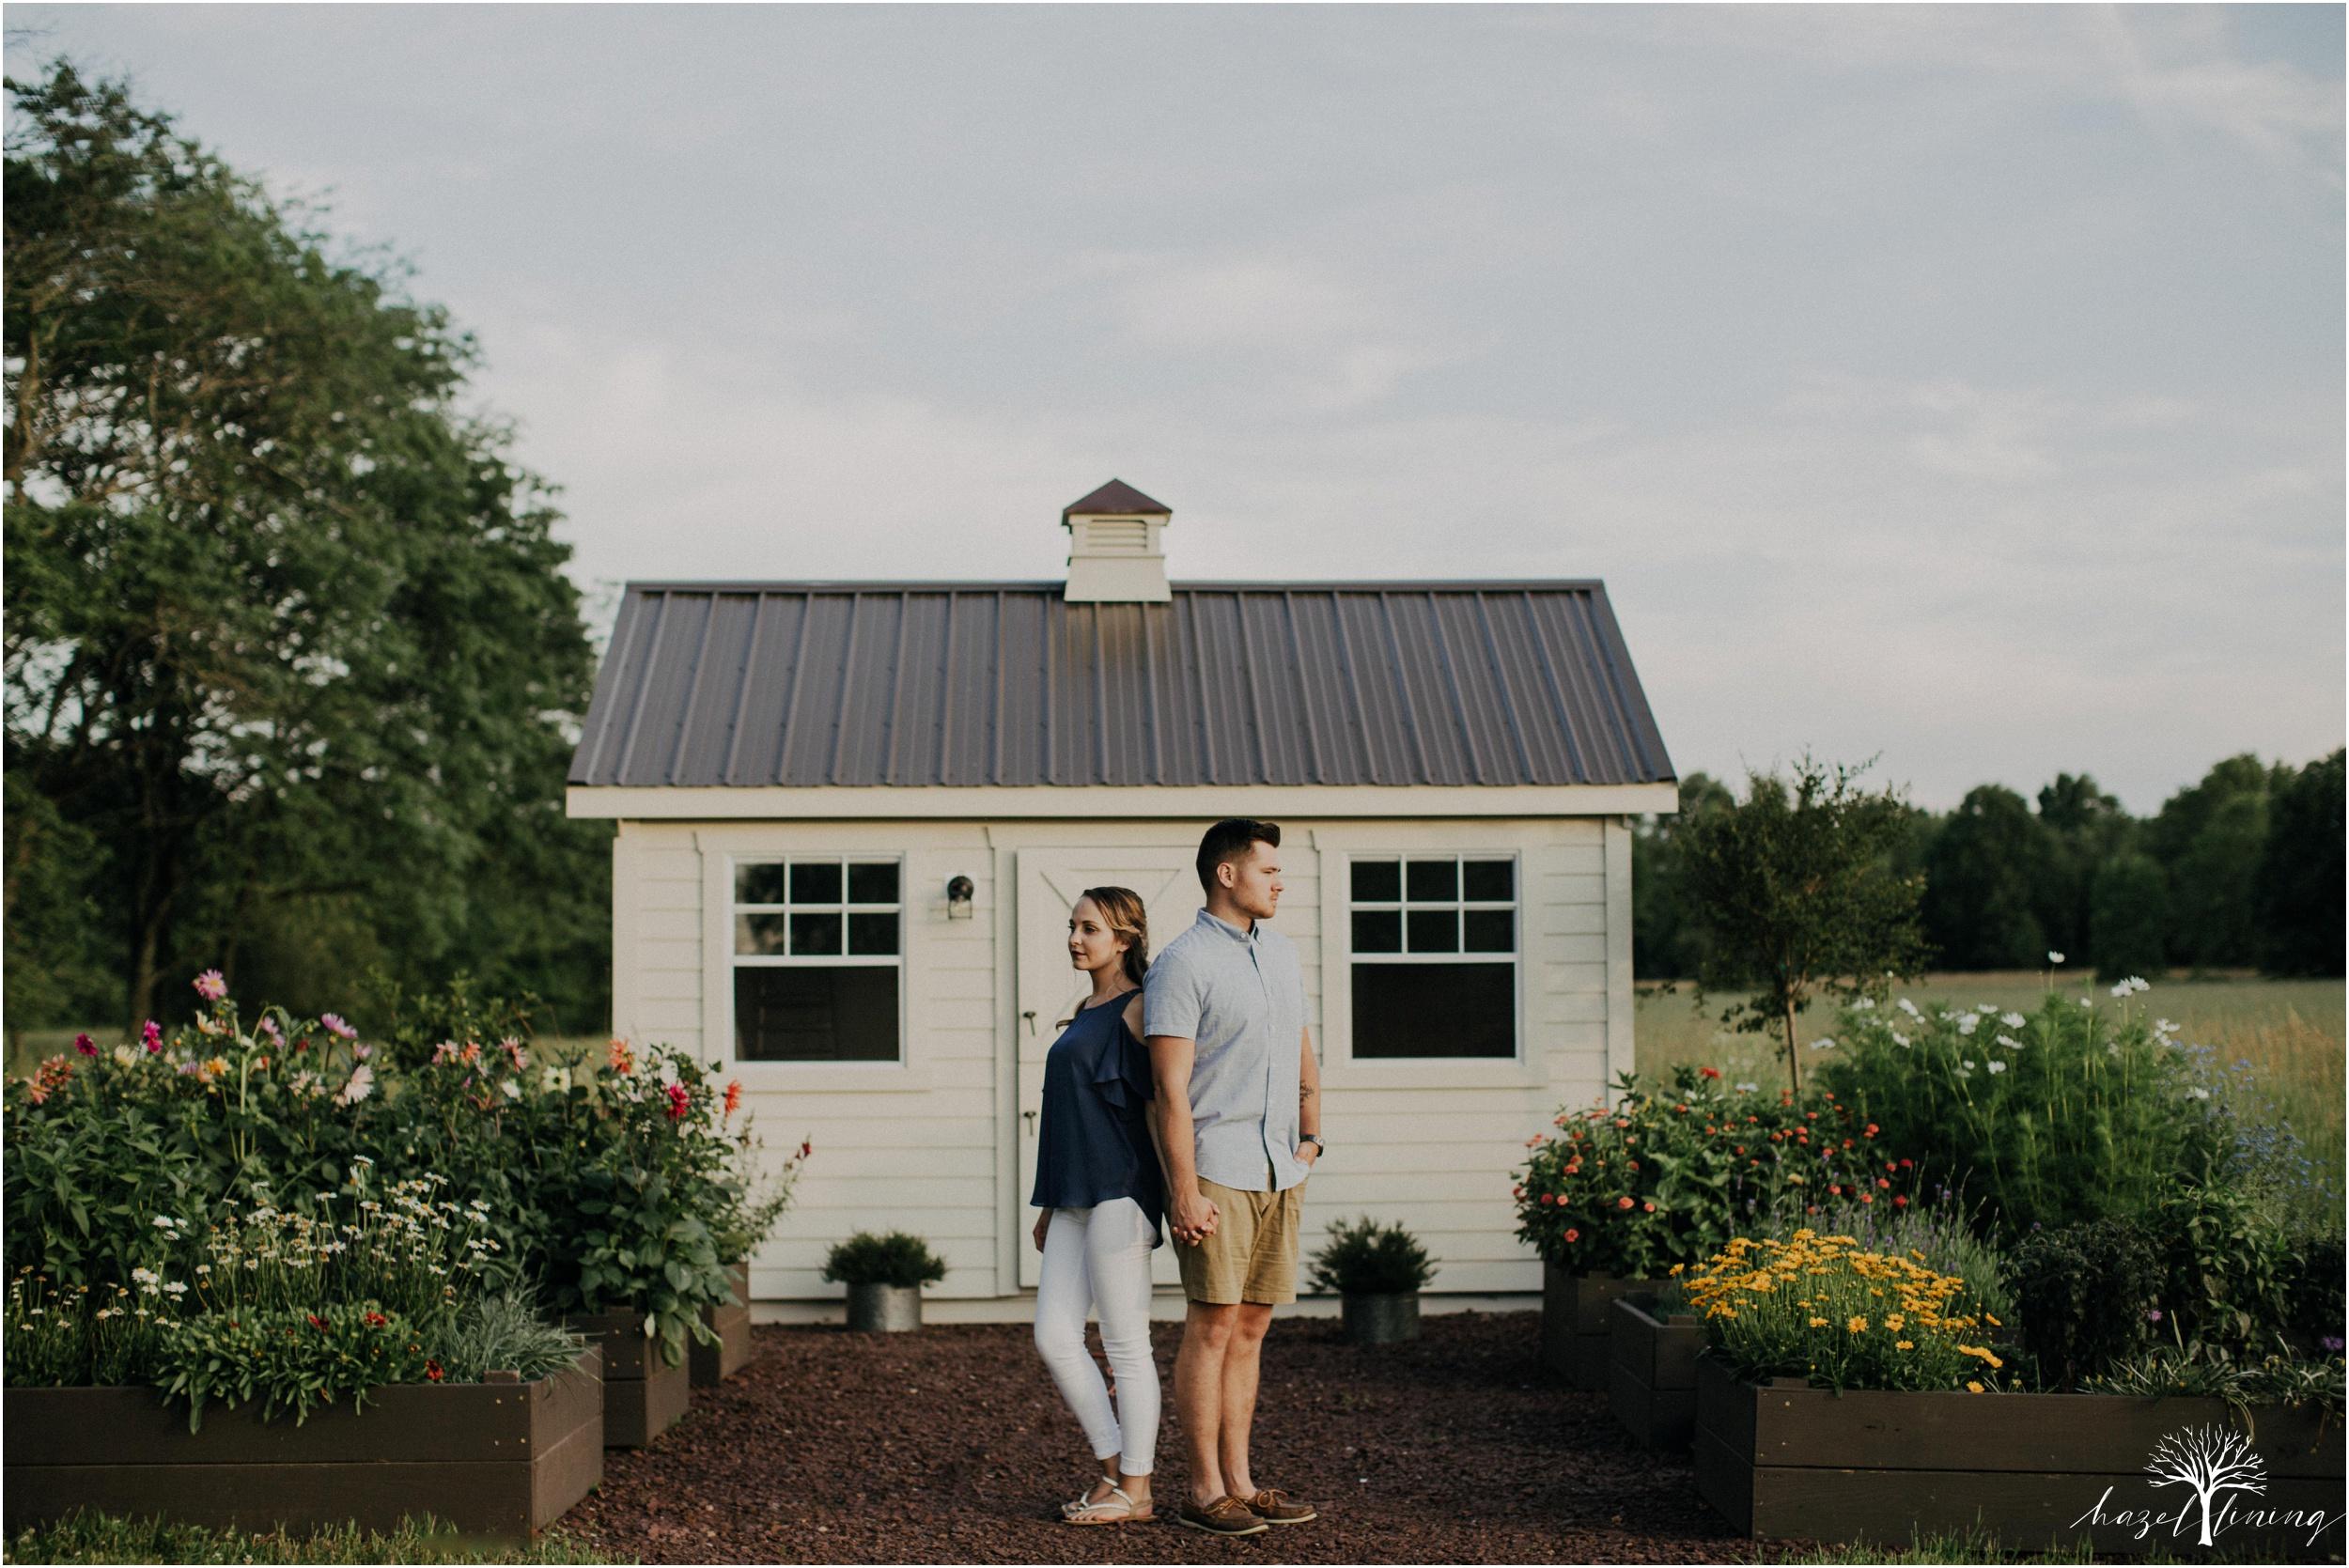 rachel-warner-chris-niedrist-the-farm-bakery-and-events-quakertown-pa-summer-engagement-hazel-lining-photography-destination-elopement-wedding-engagement-photography_0051.jpg